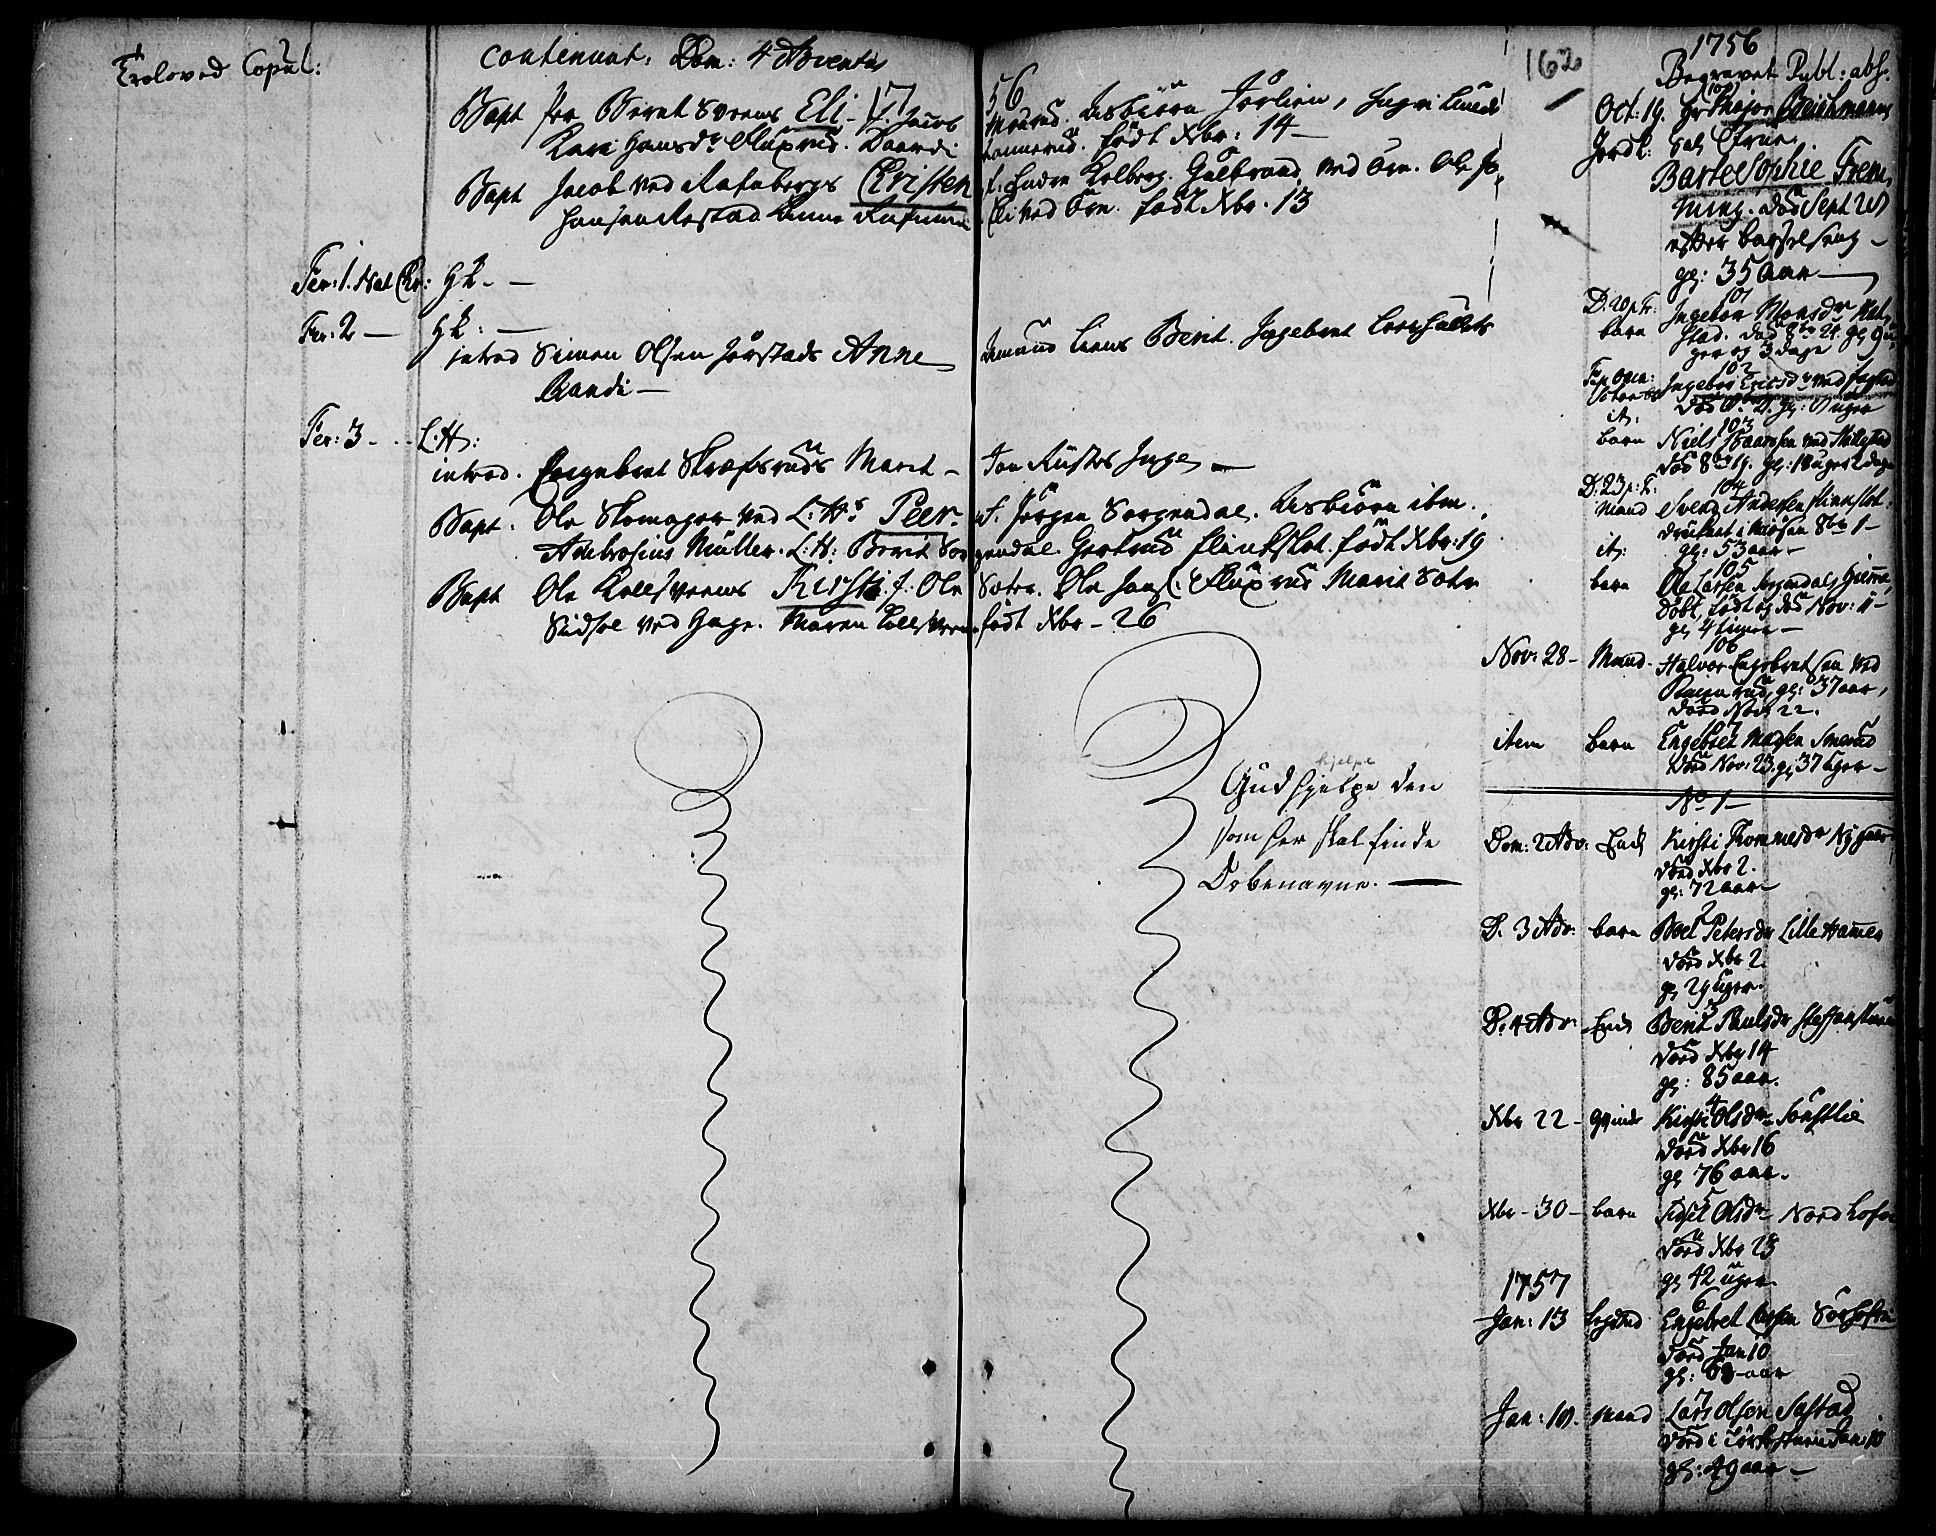 SAH, Fåberg prestekontor, Ministerialbok nr. 1, 1727-1775, s. 162